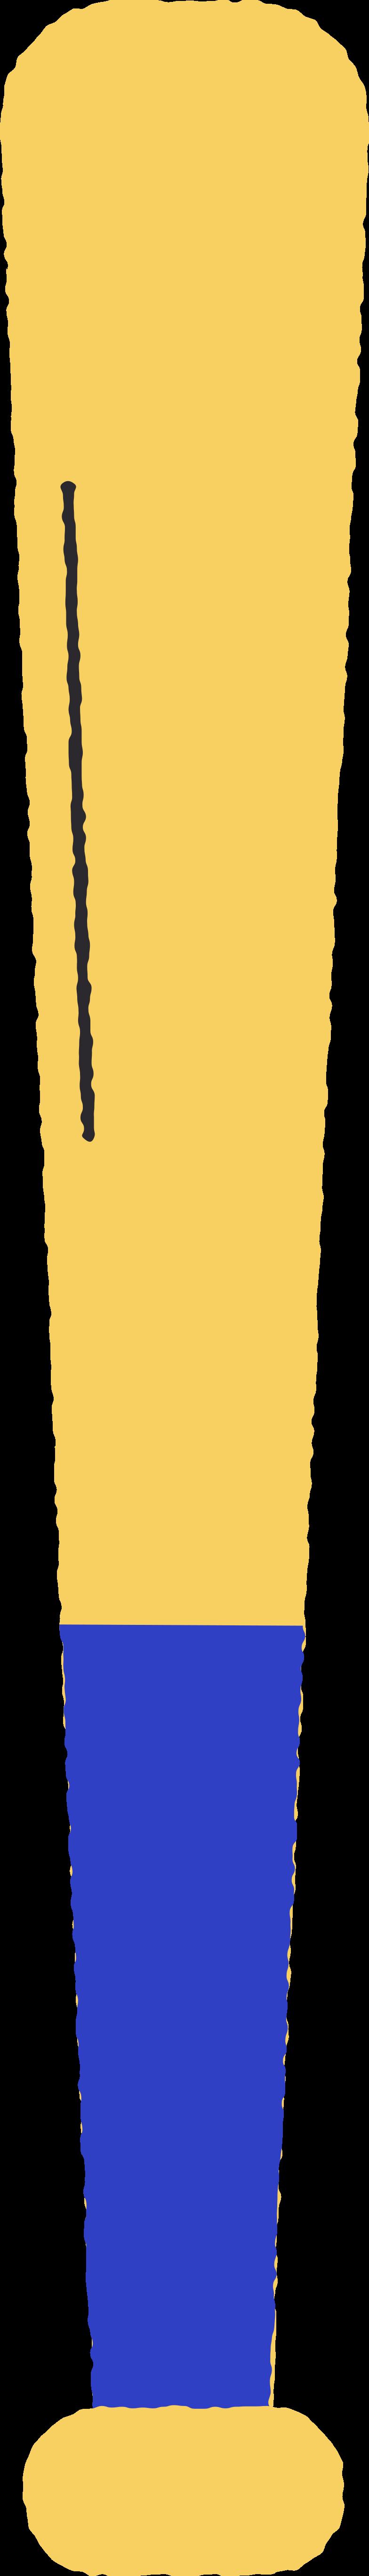 Ilustración de clipart de bate de béisbol en PNG, SVG